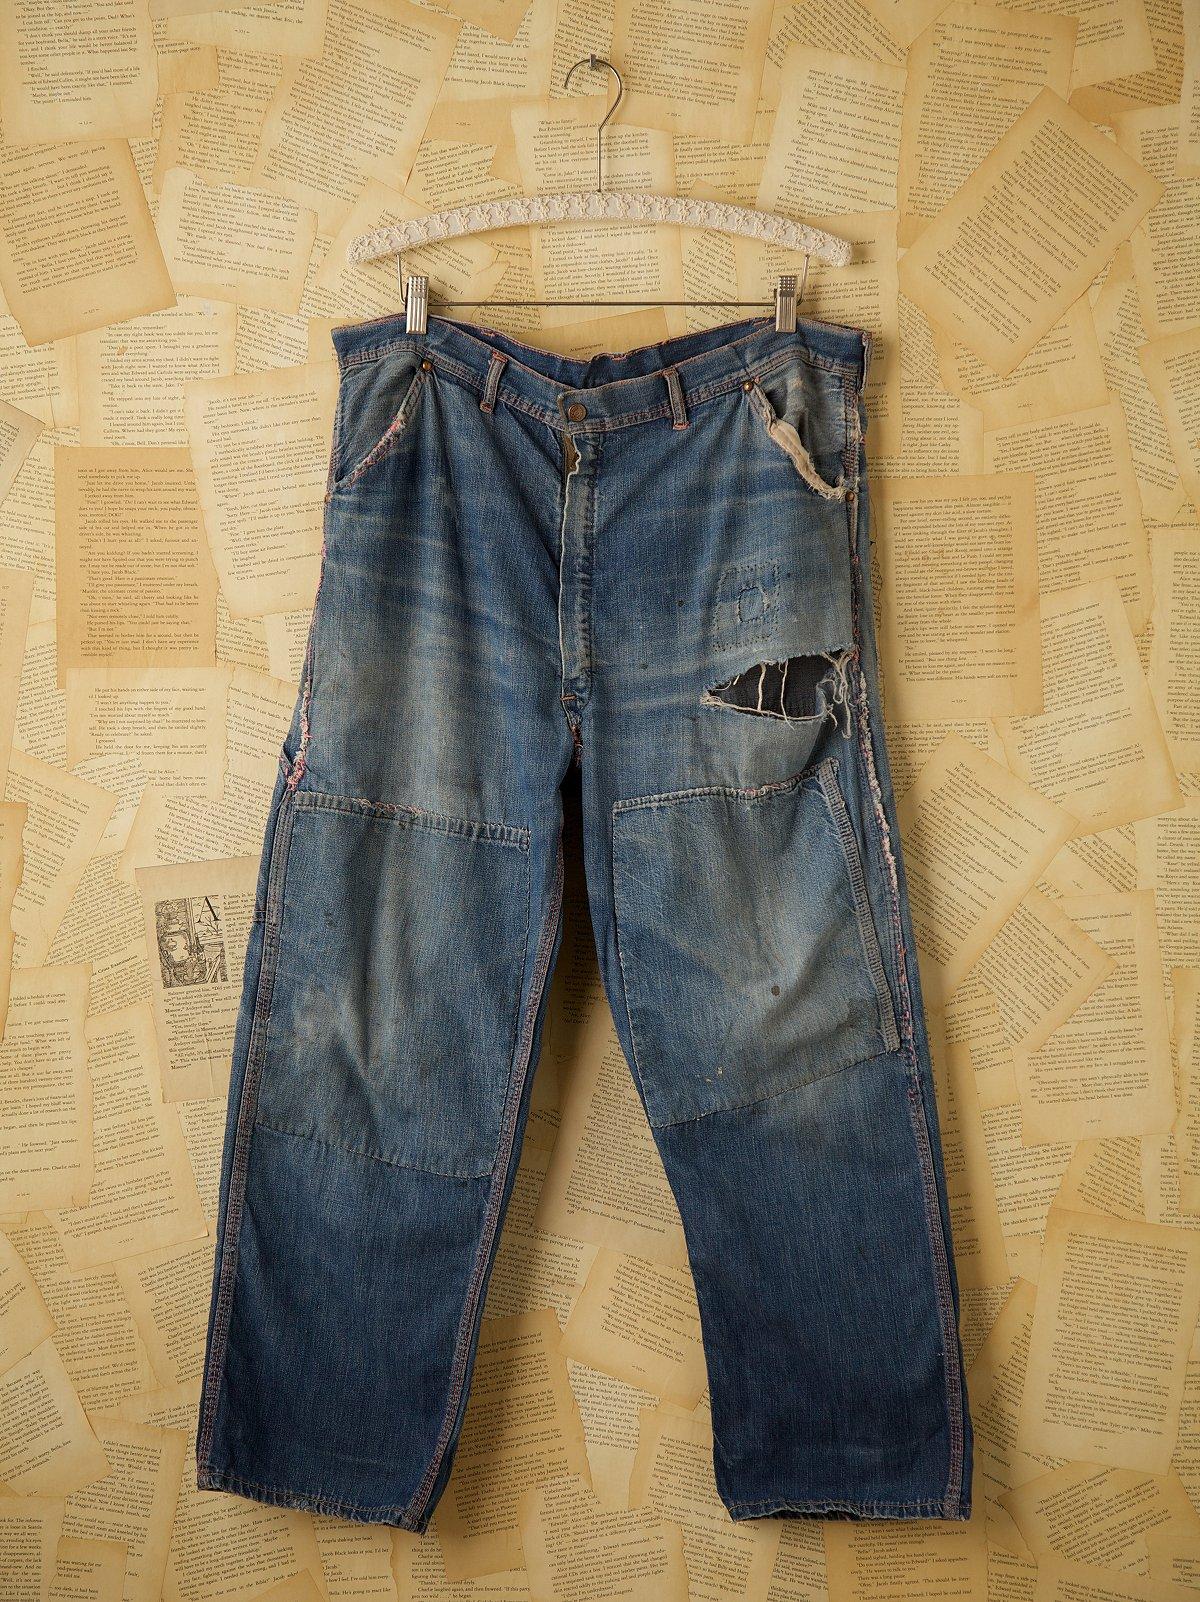 Vintage DubbleWare Work Jeans